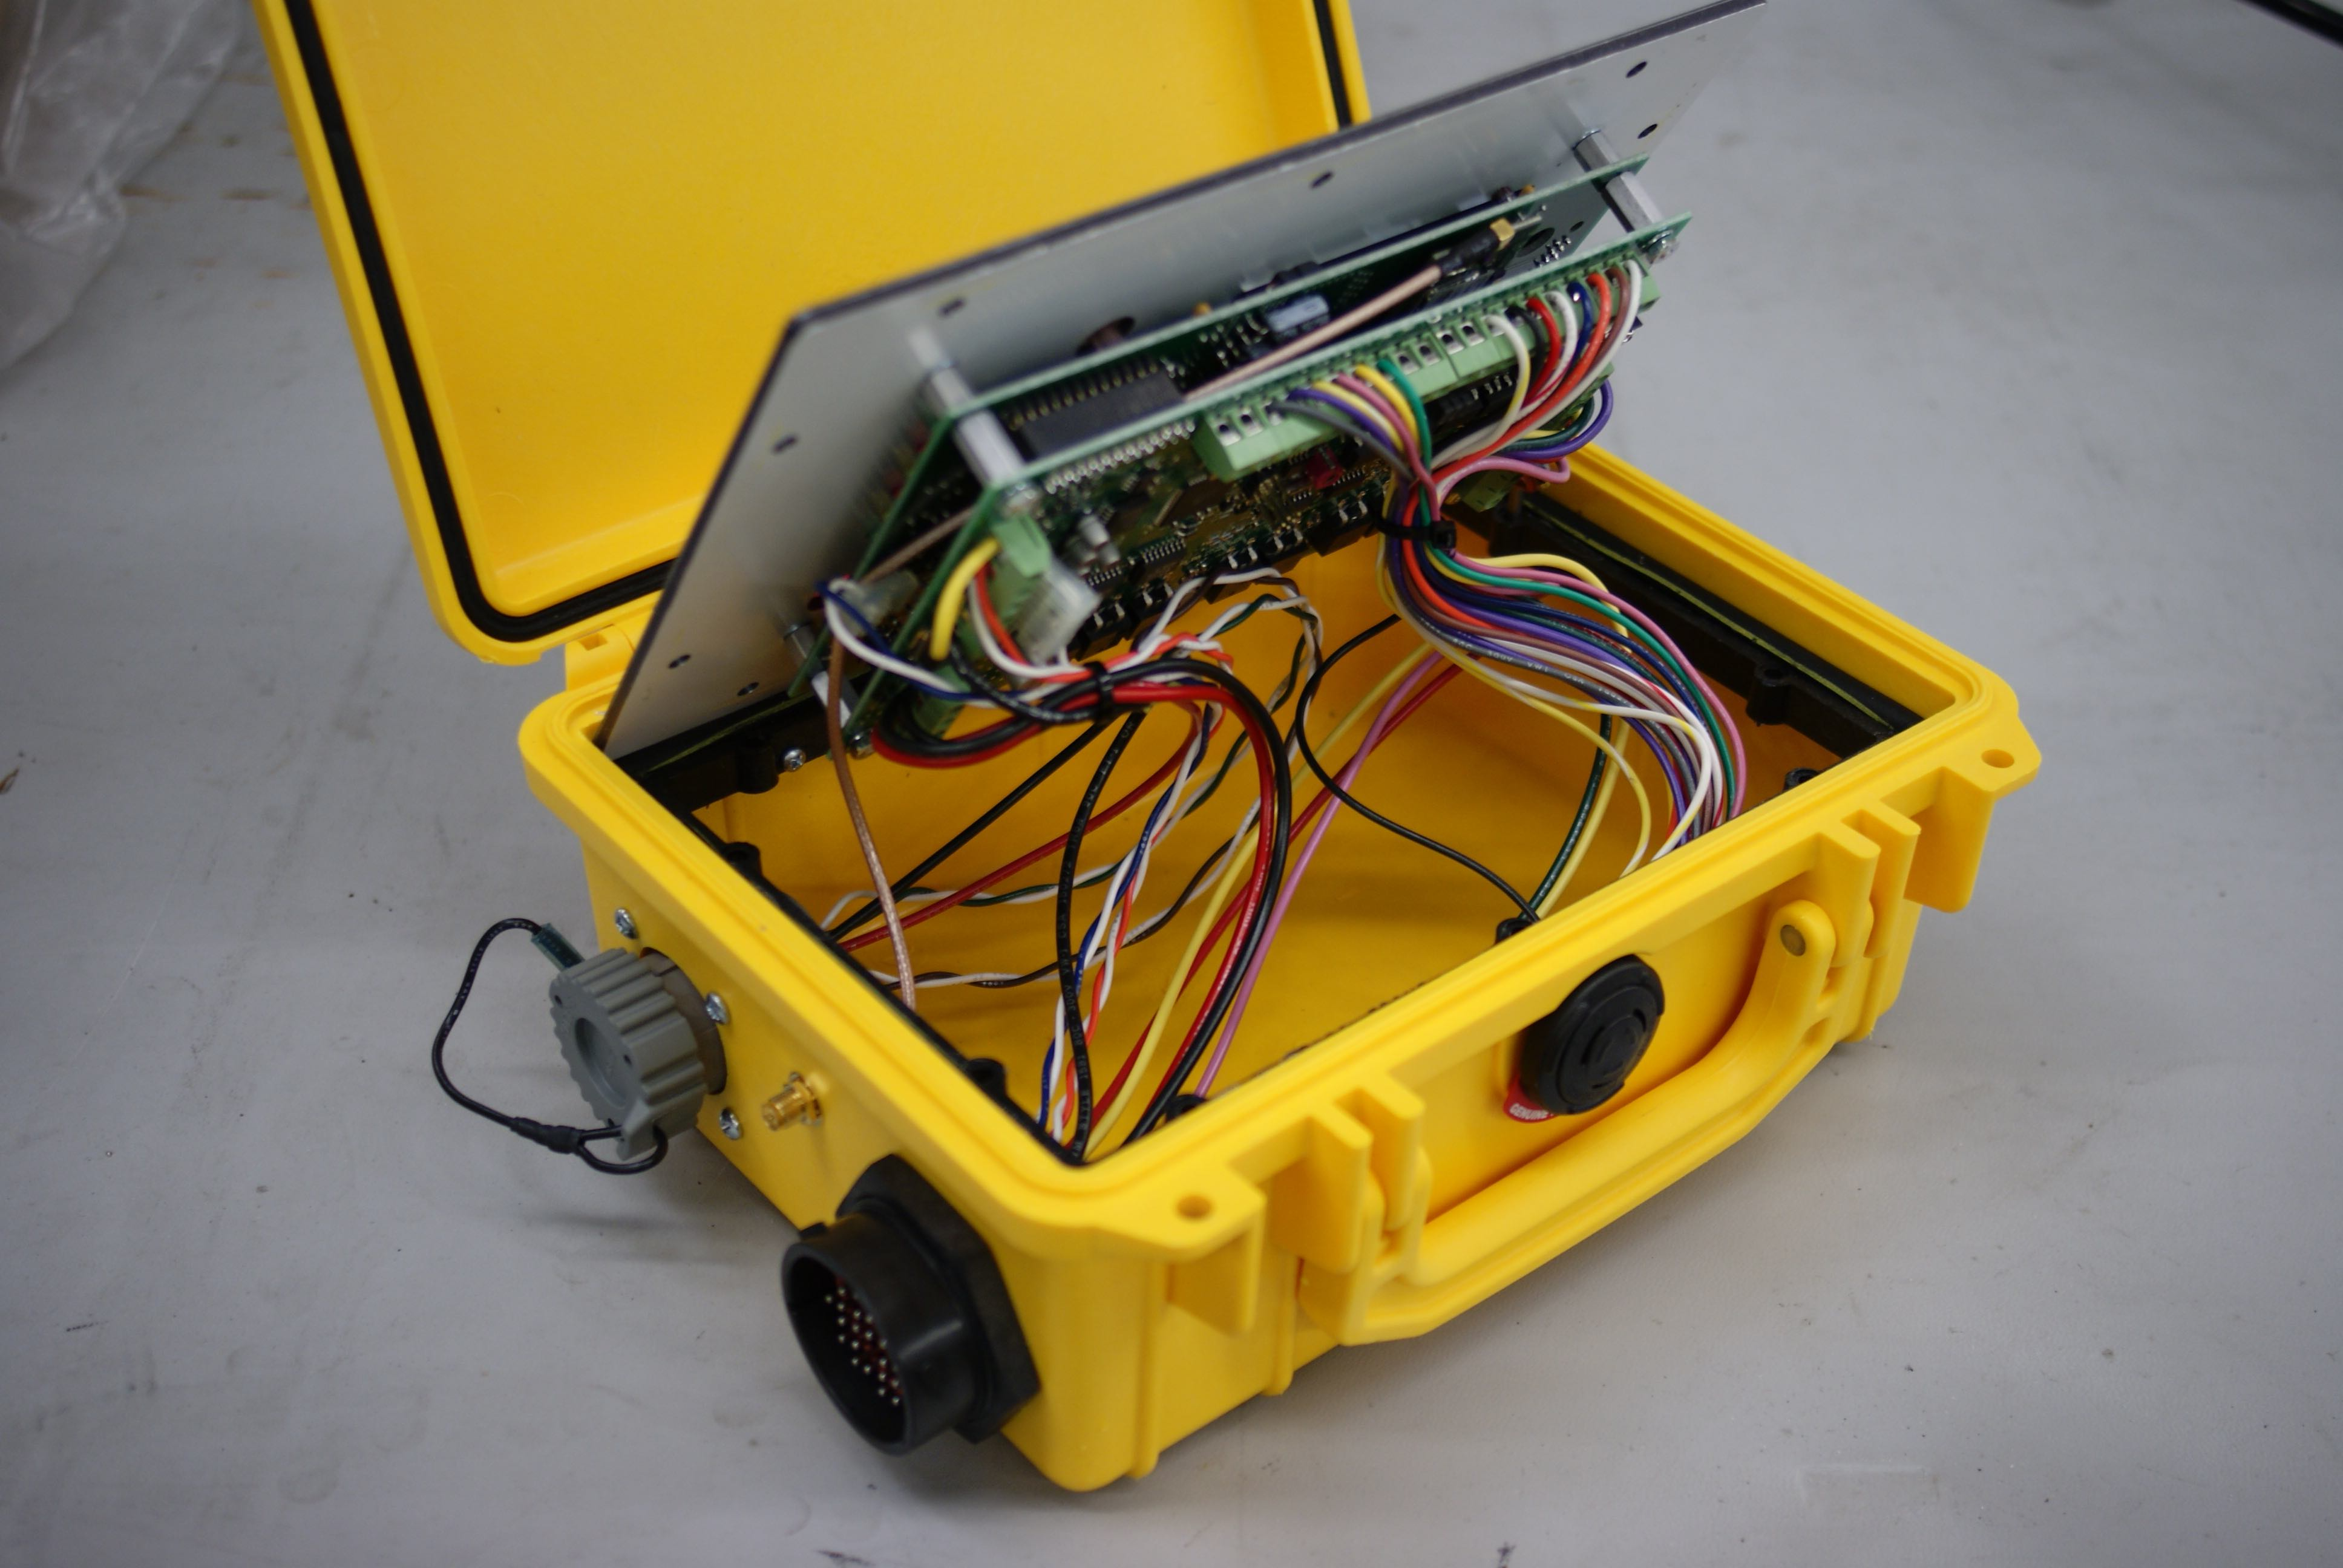 electromechanical and box build